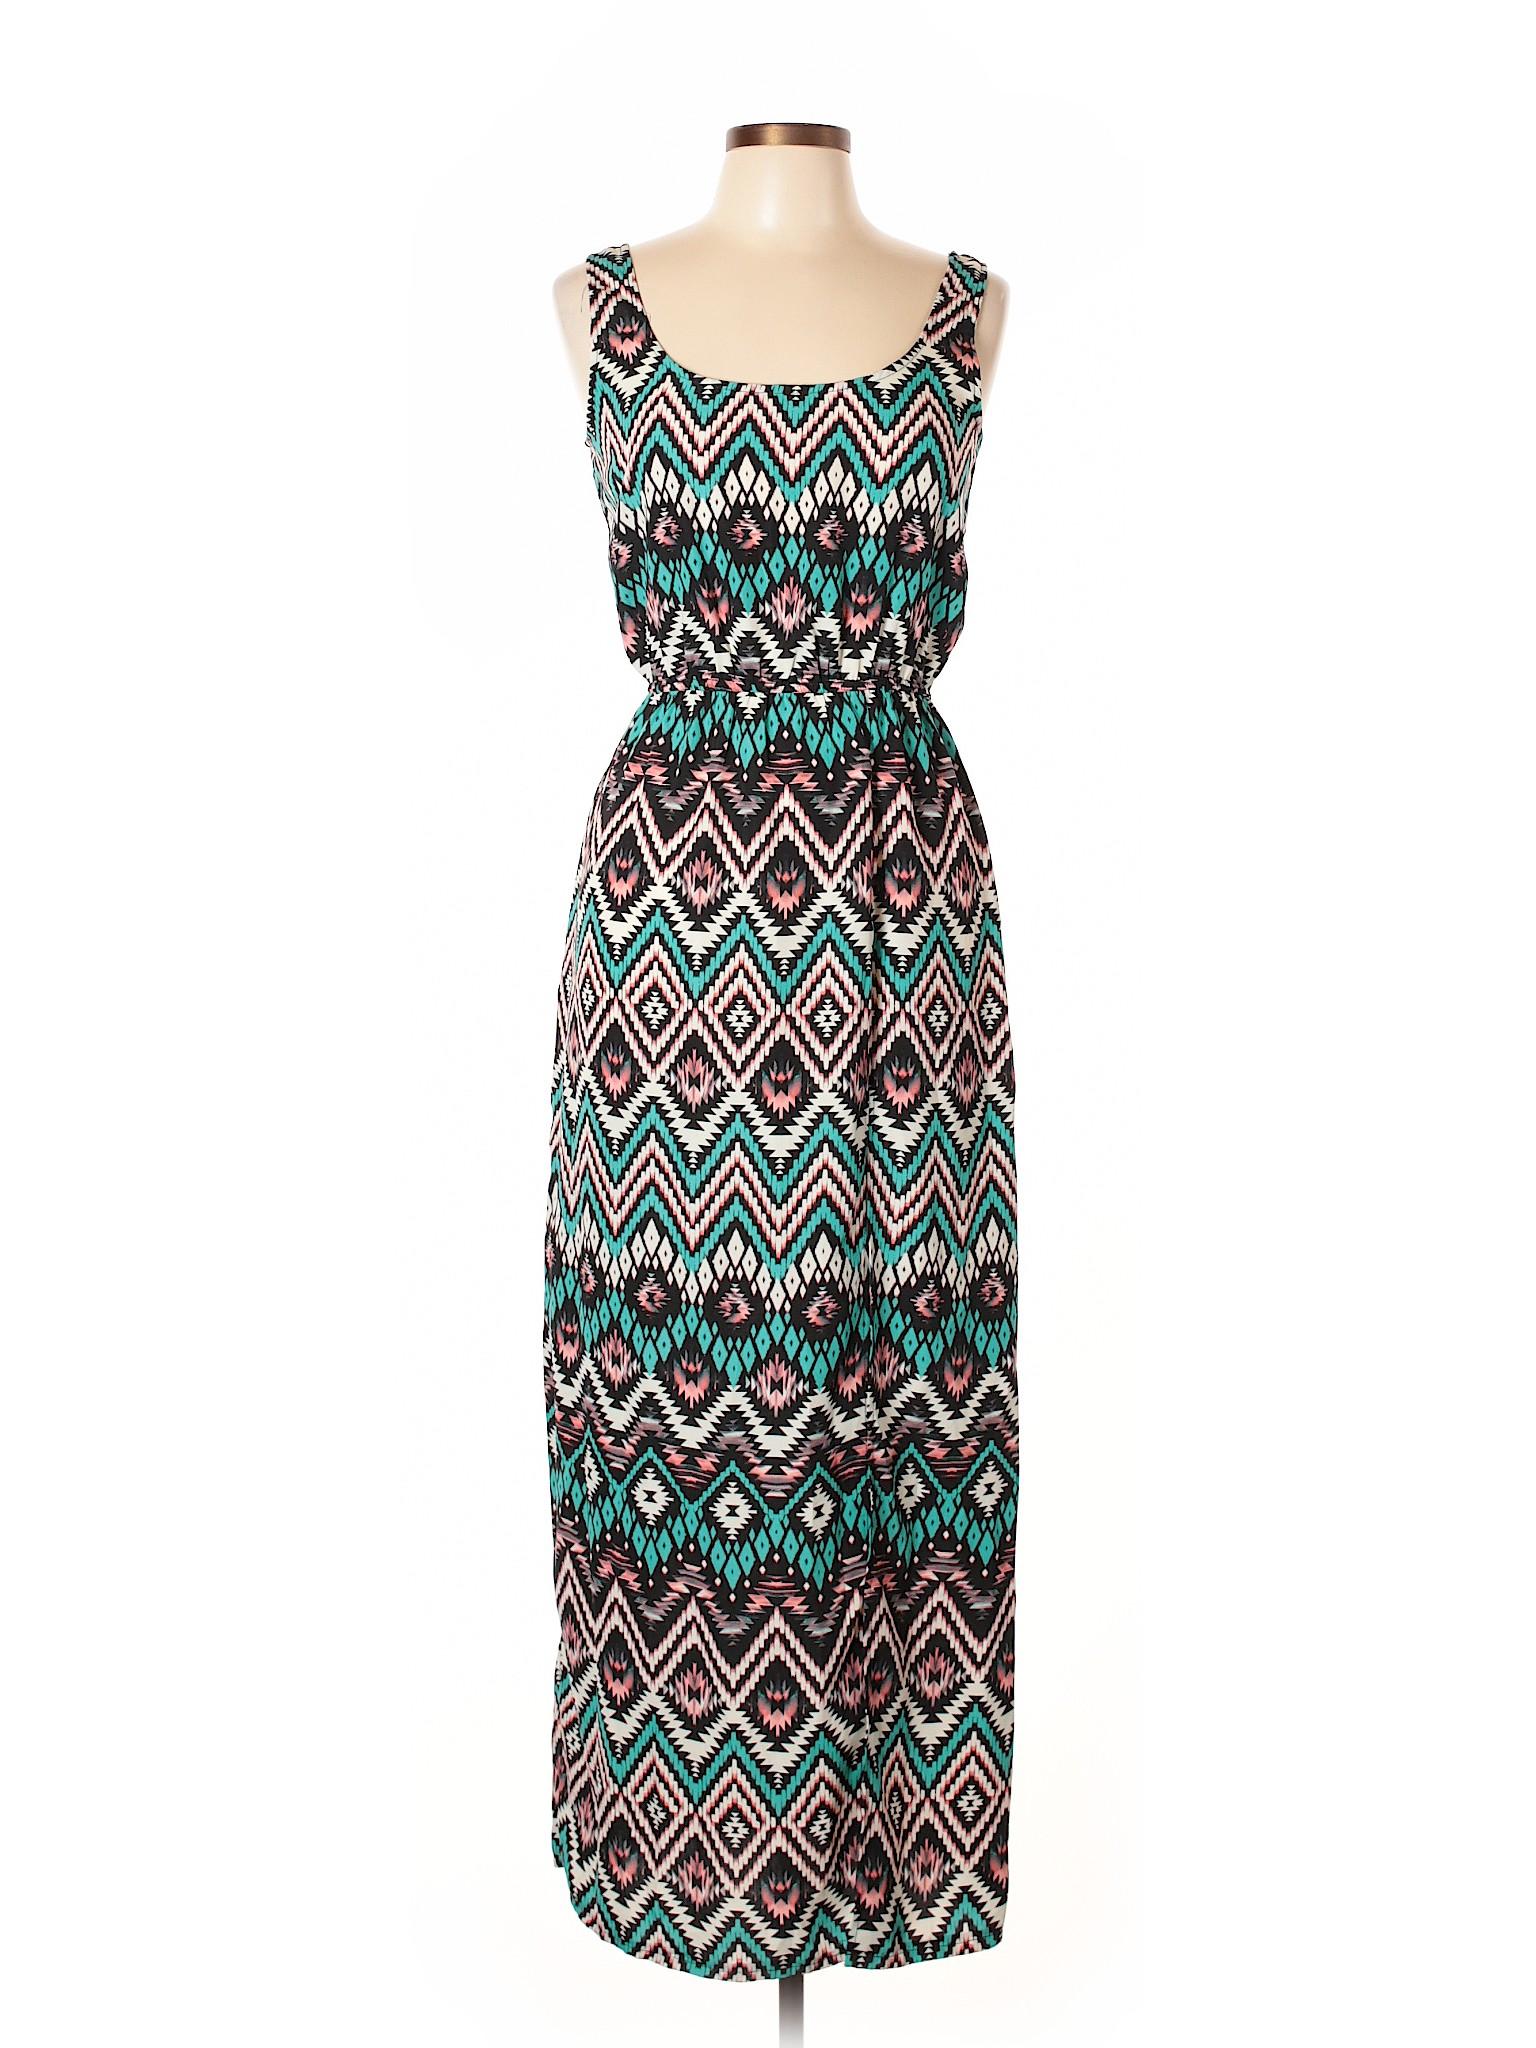 2fc1bbc24e1 New Look Womens Maxi Dresses - Data Dynamic AG